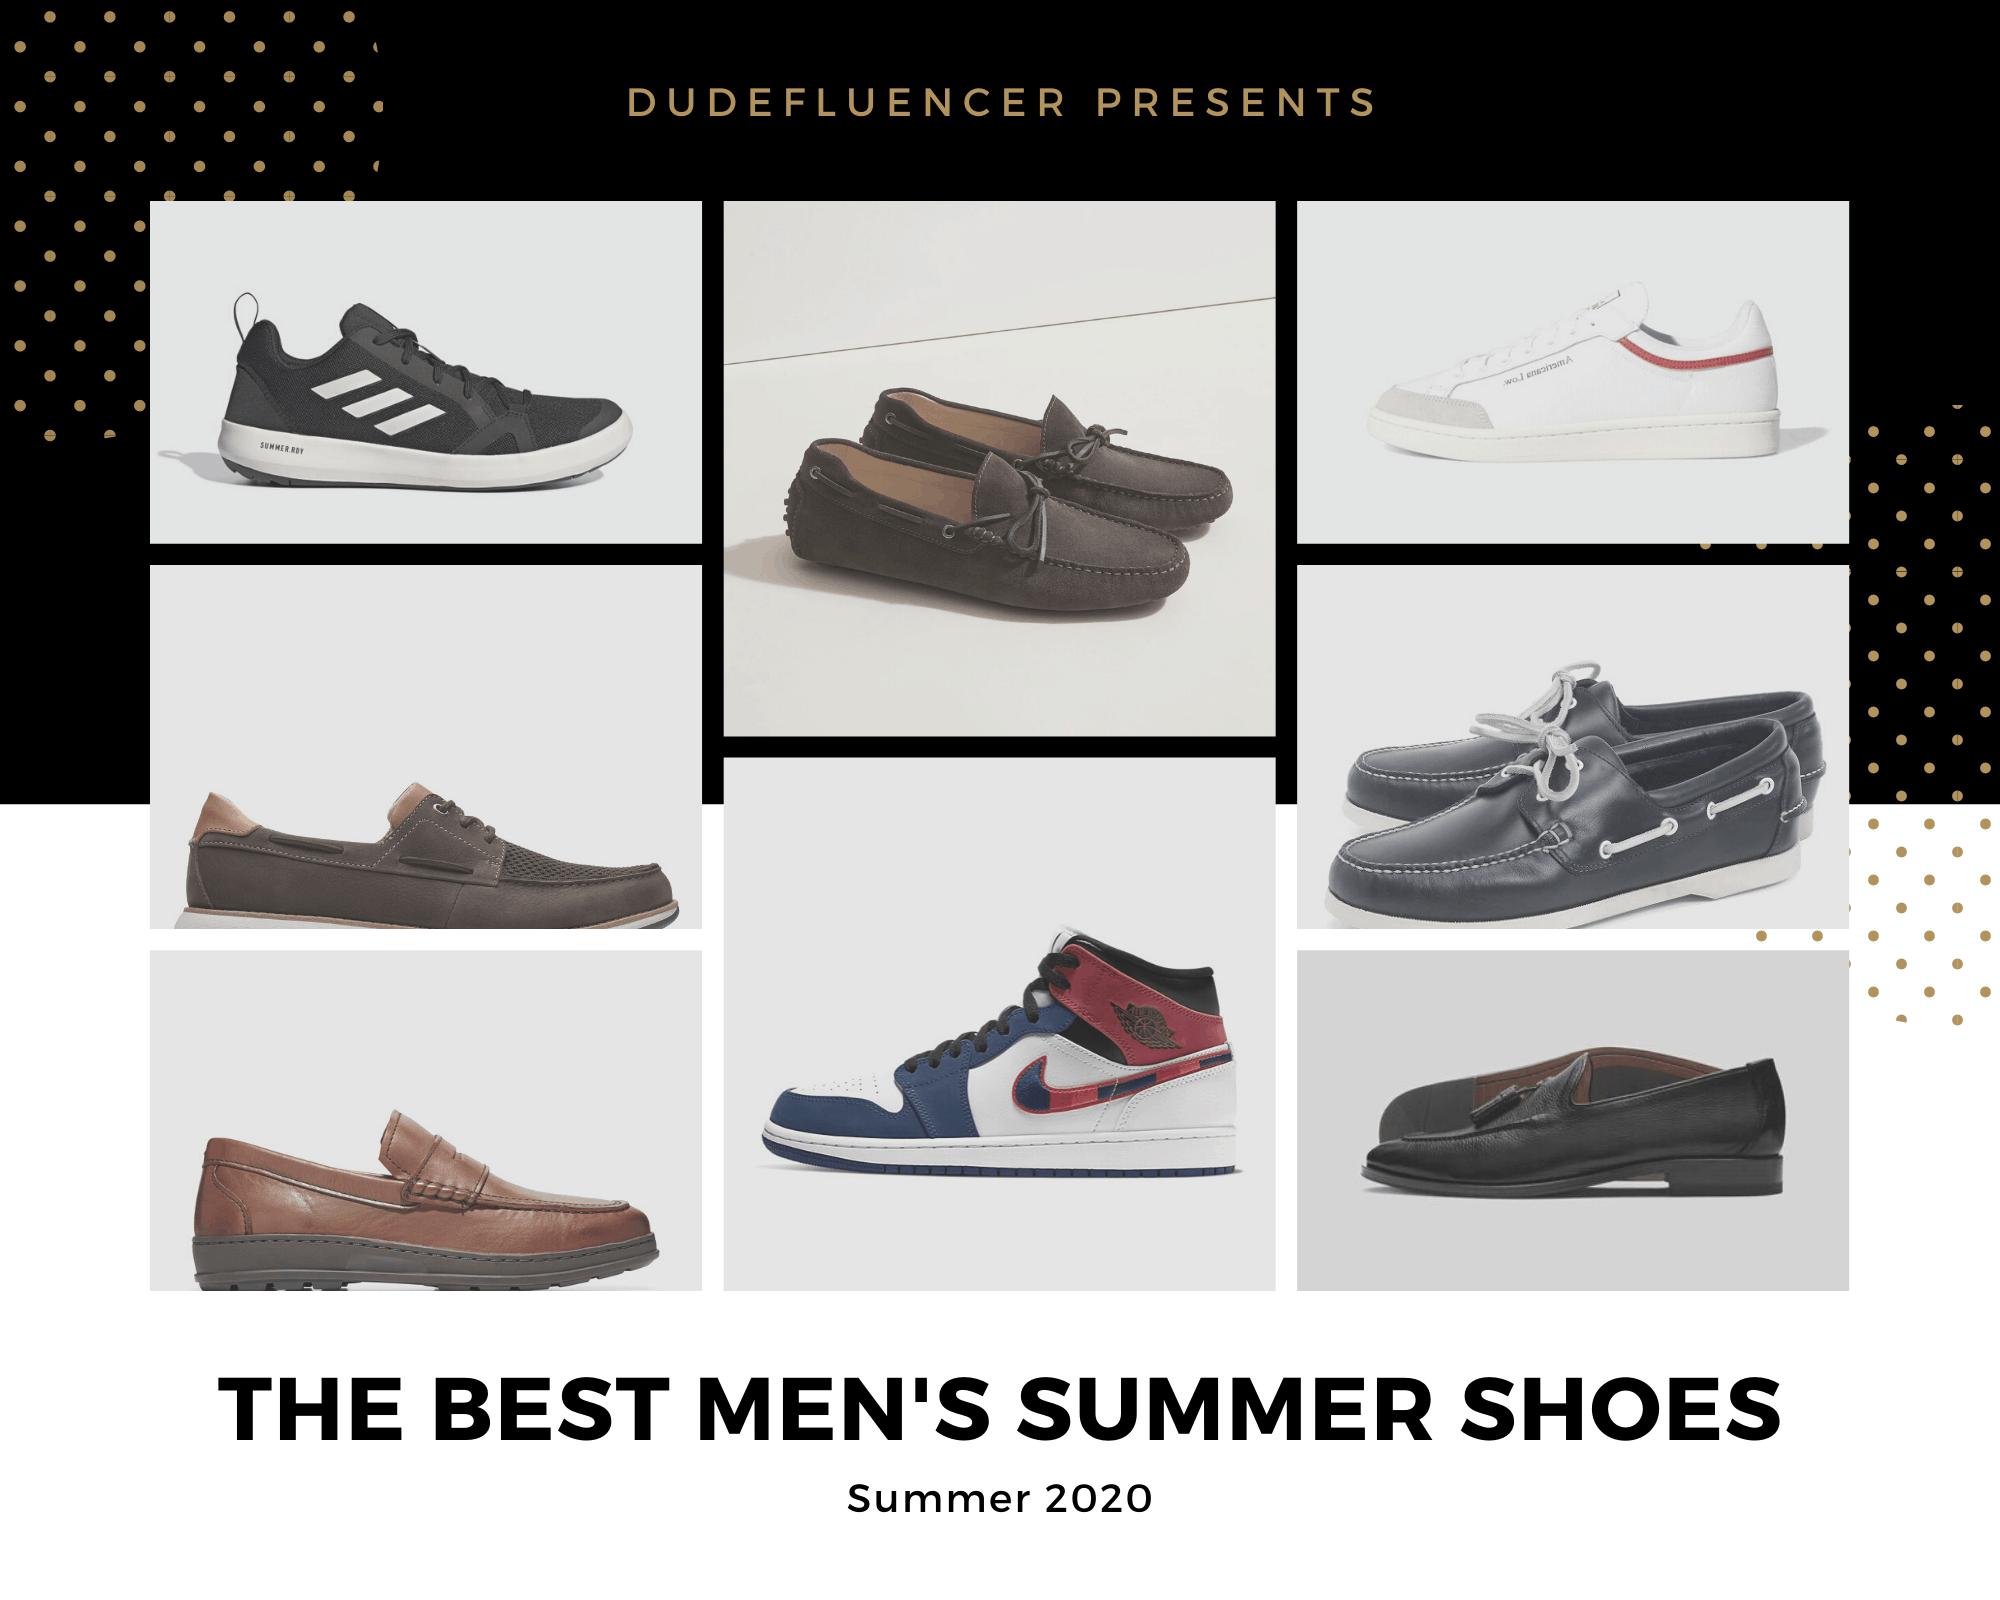 Dudefluencer: Best Men's Summer Shoes